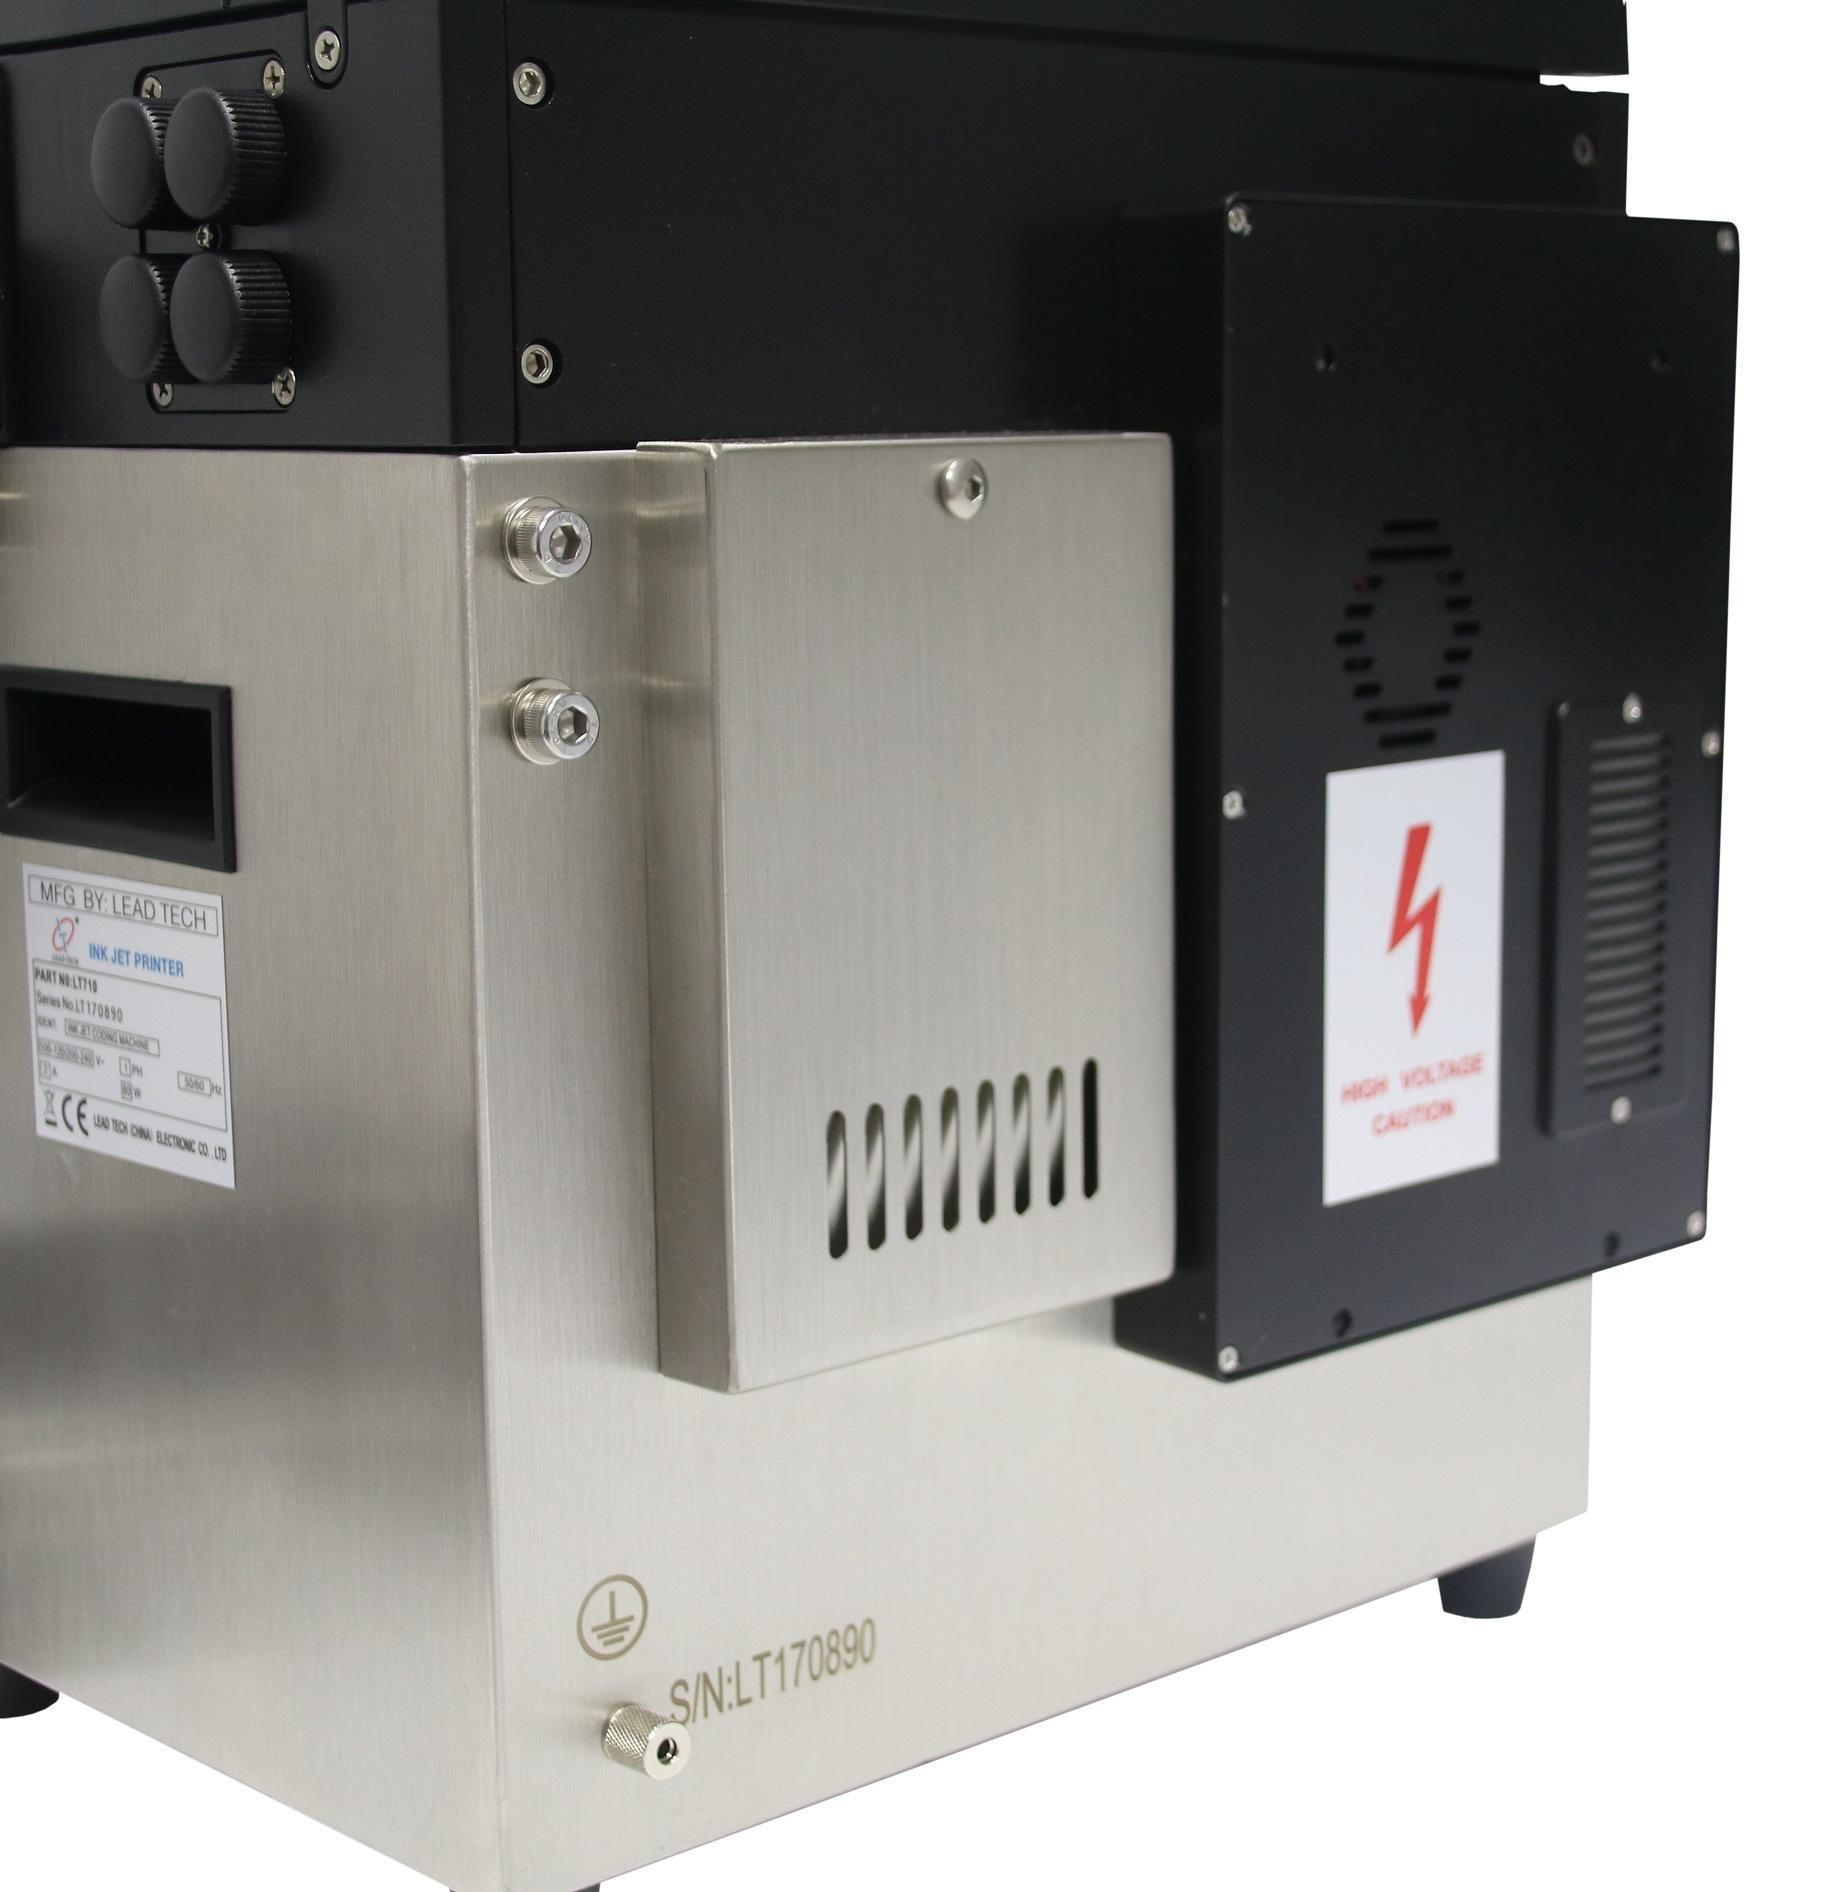 Lead Tech Plastic film Continuous Cij Inkjet Printer Lt760